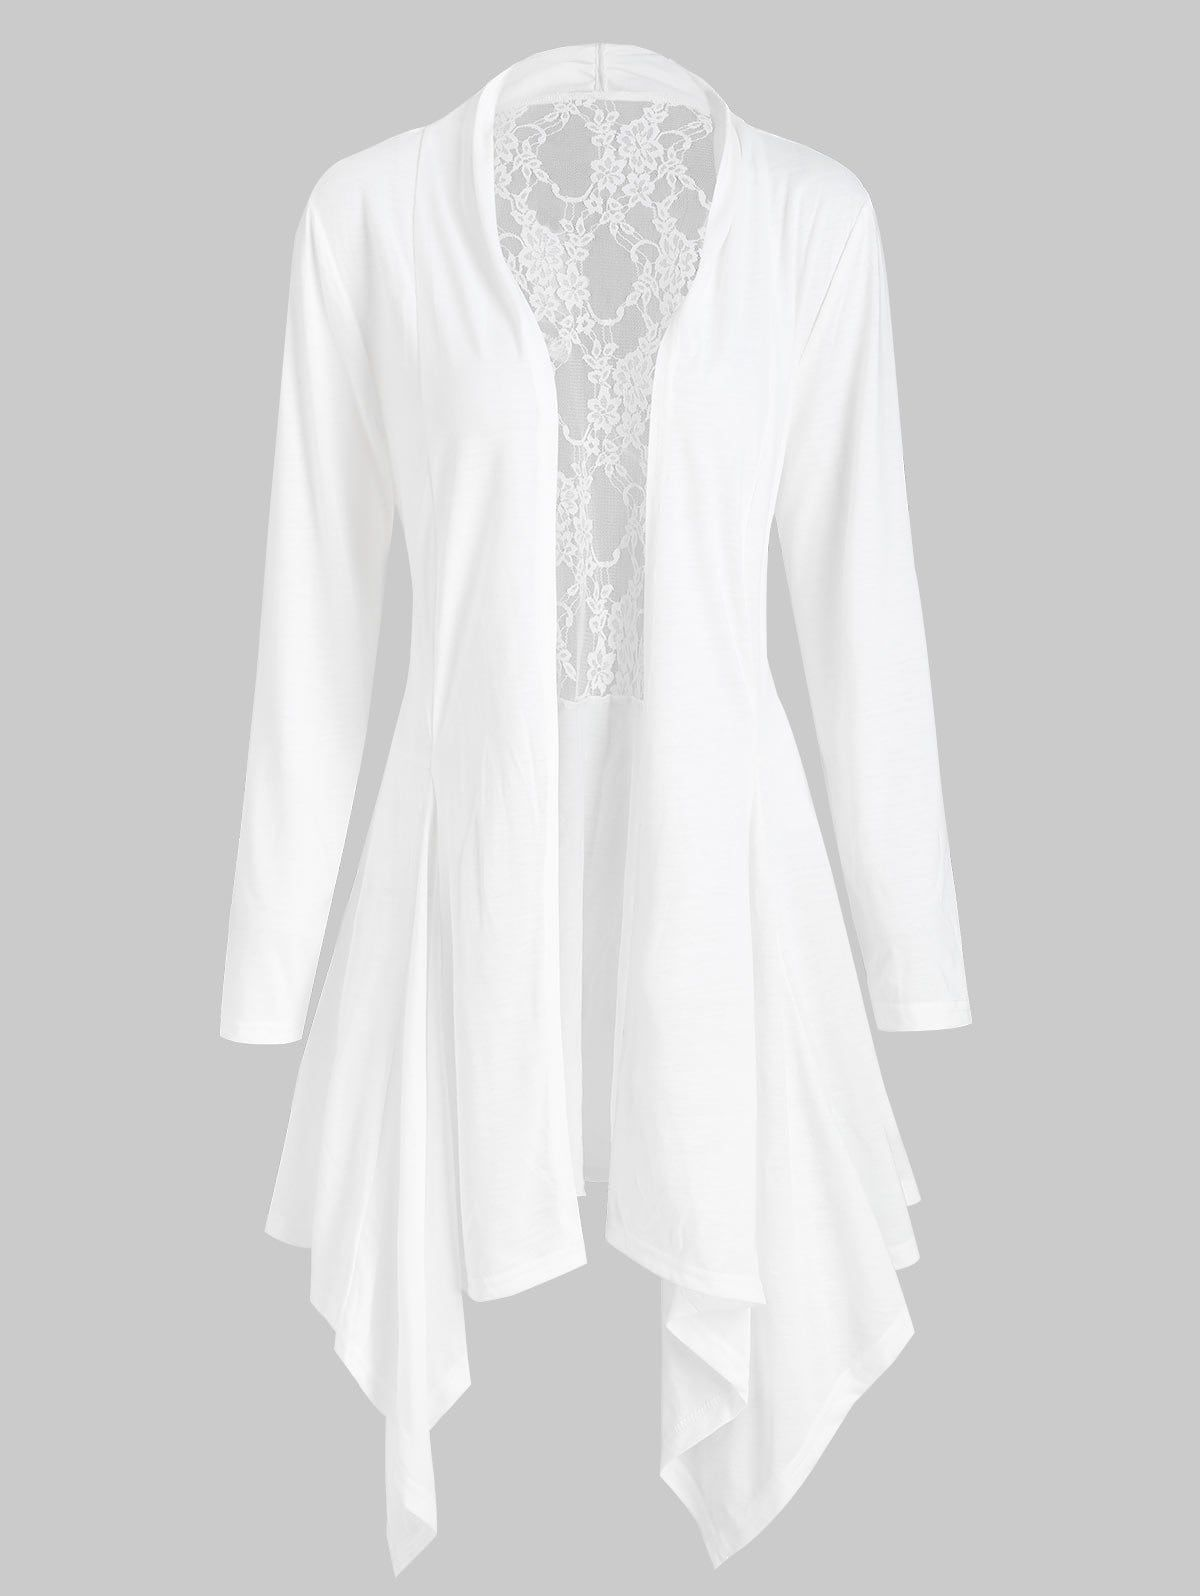 Handkerchief Lace Panel Open Front Plus Size Cardigan | Lacer